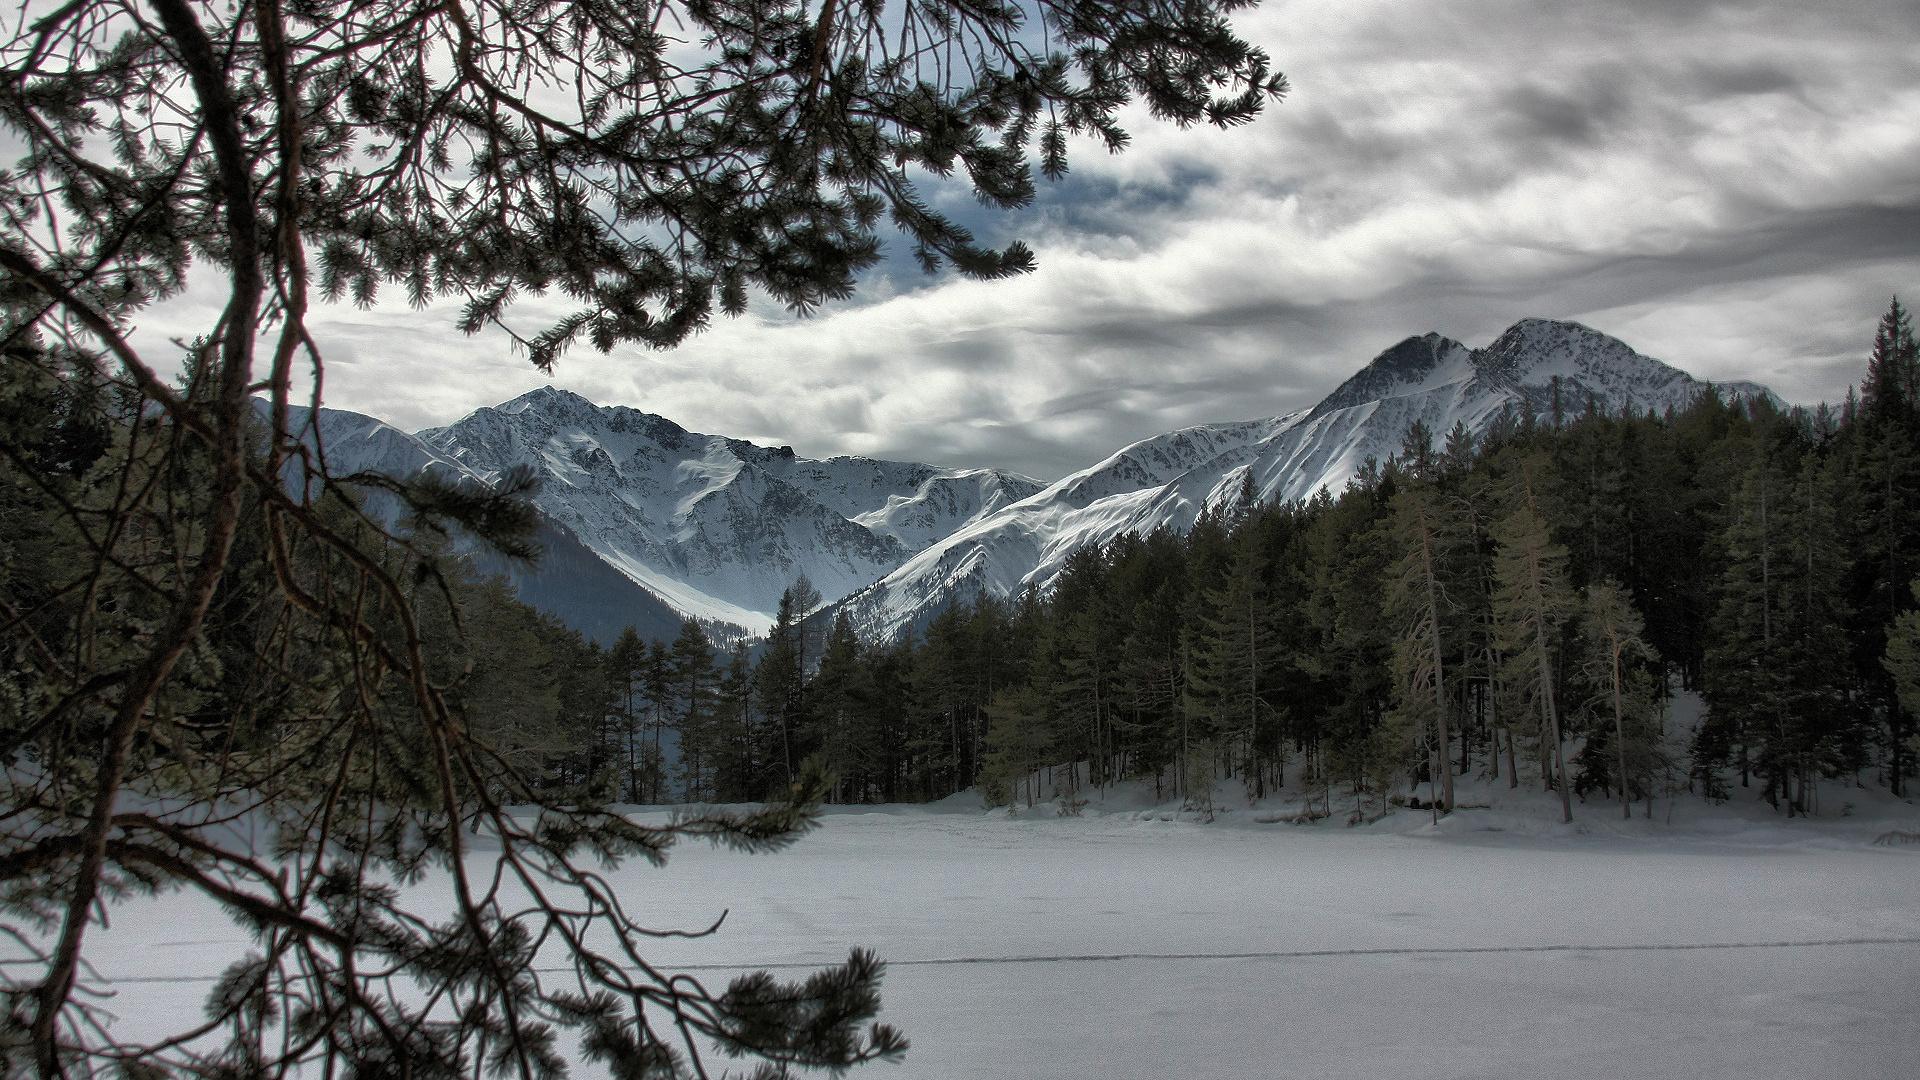 3d Ice Wolf Wallpaper Frozen Forest Backgrounds Hd Desktop Wallpapers 4k Hd